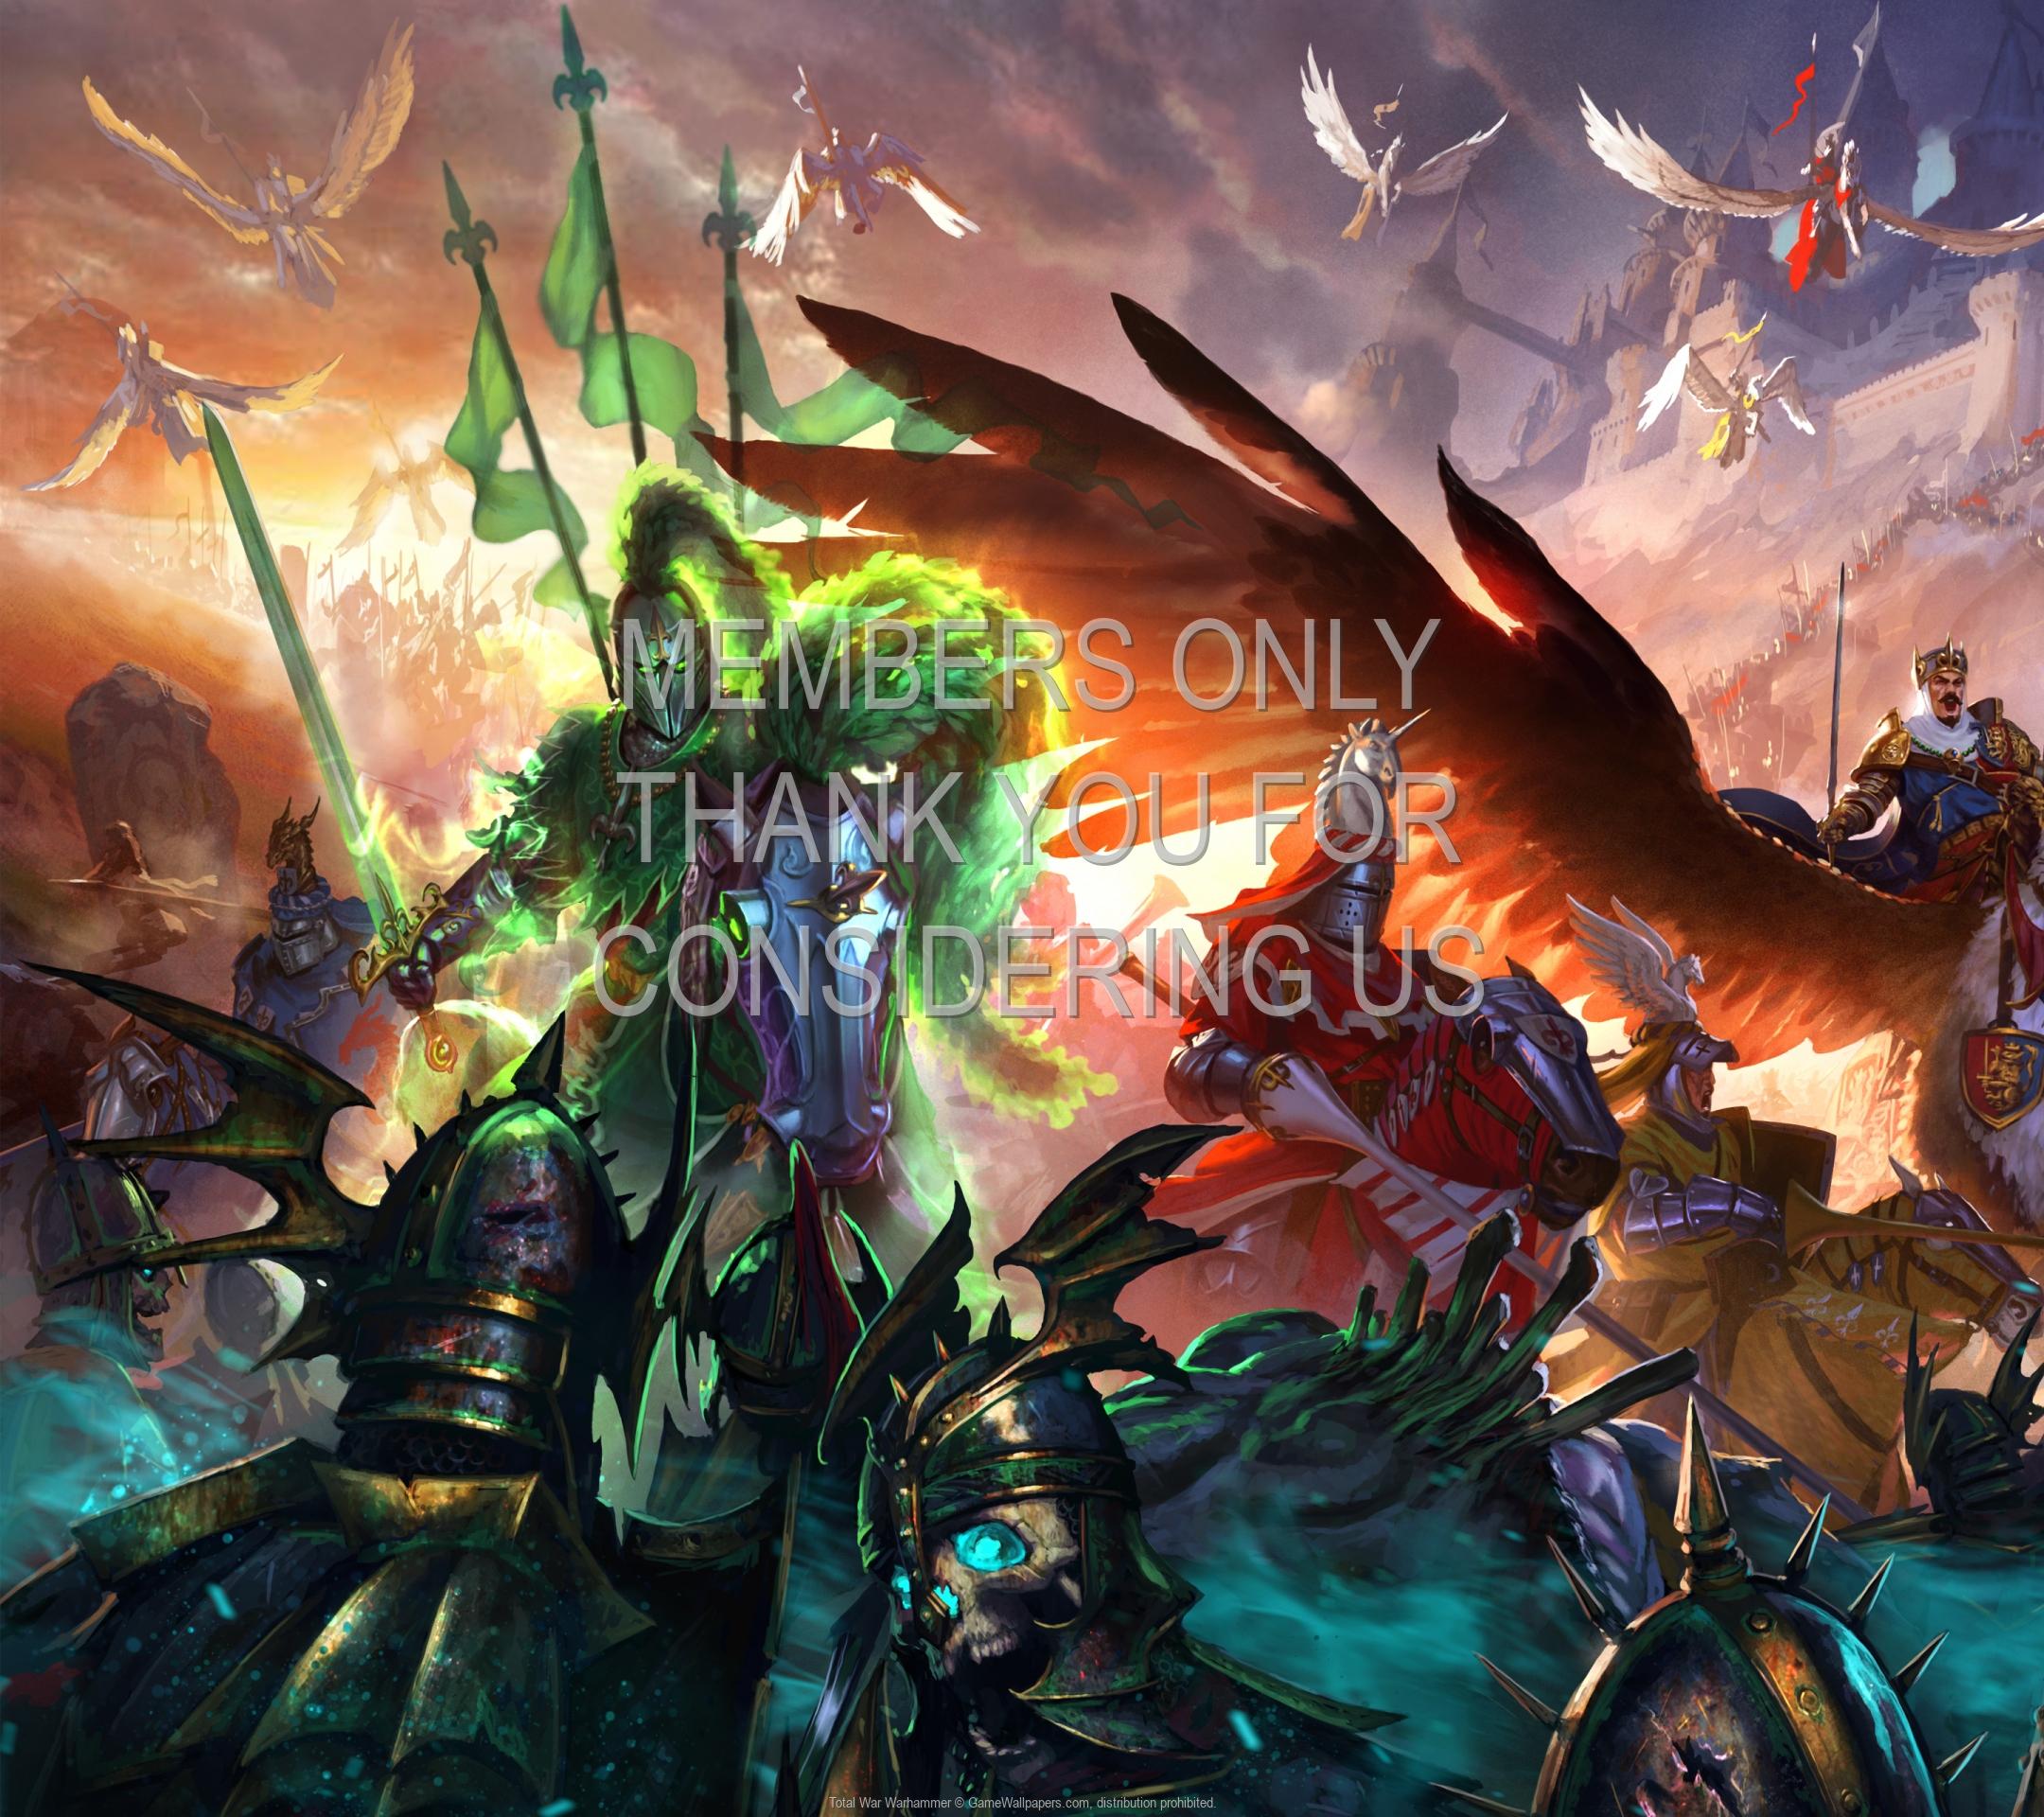 Total War: Warhammer 1920x1080 Mobile wallpaper or background 06